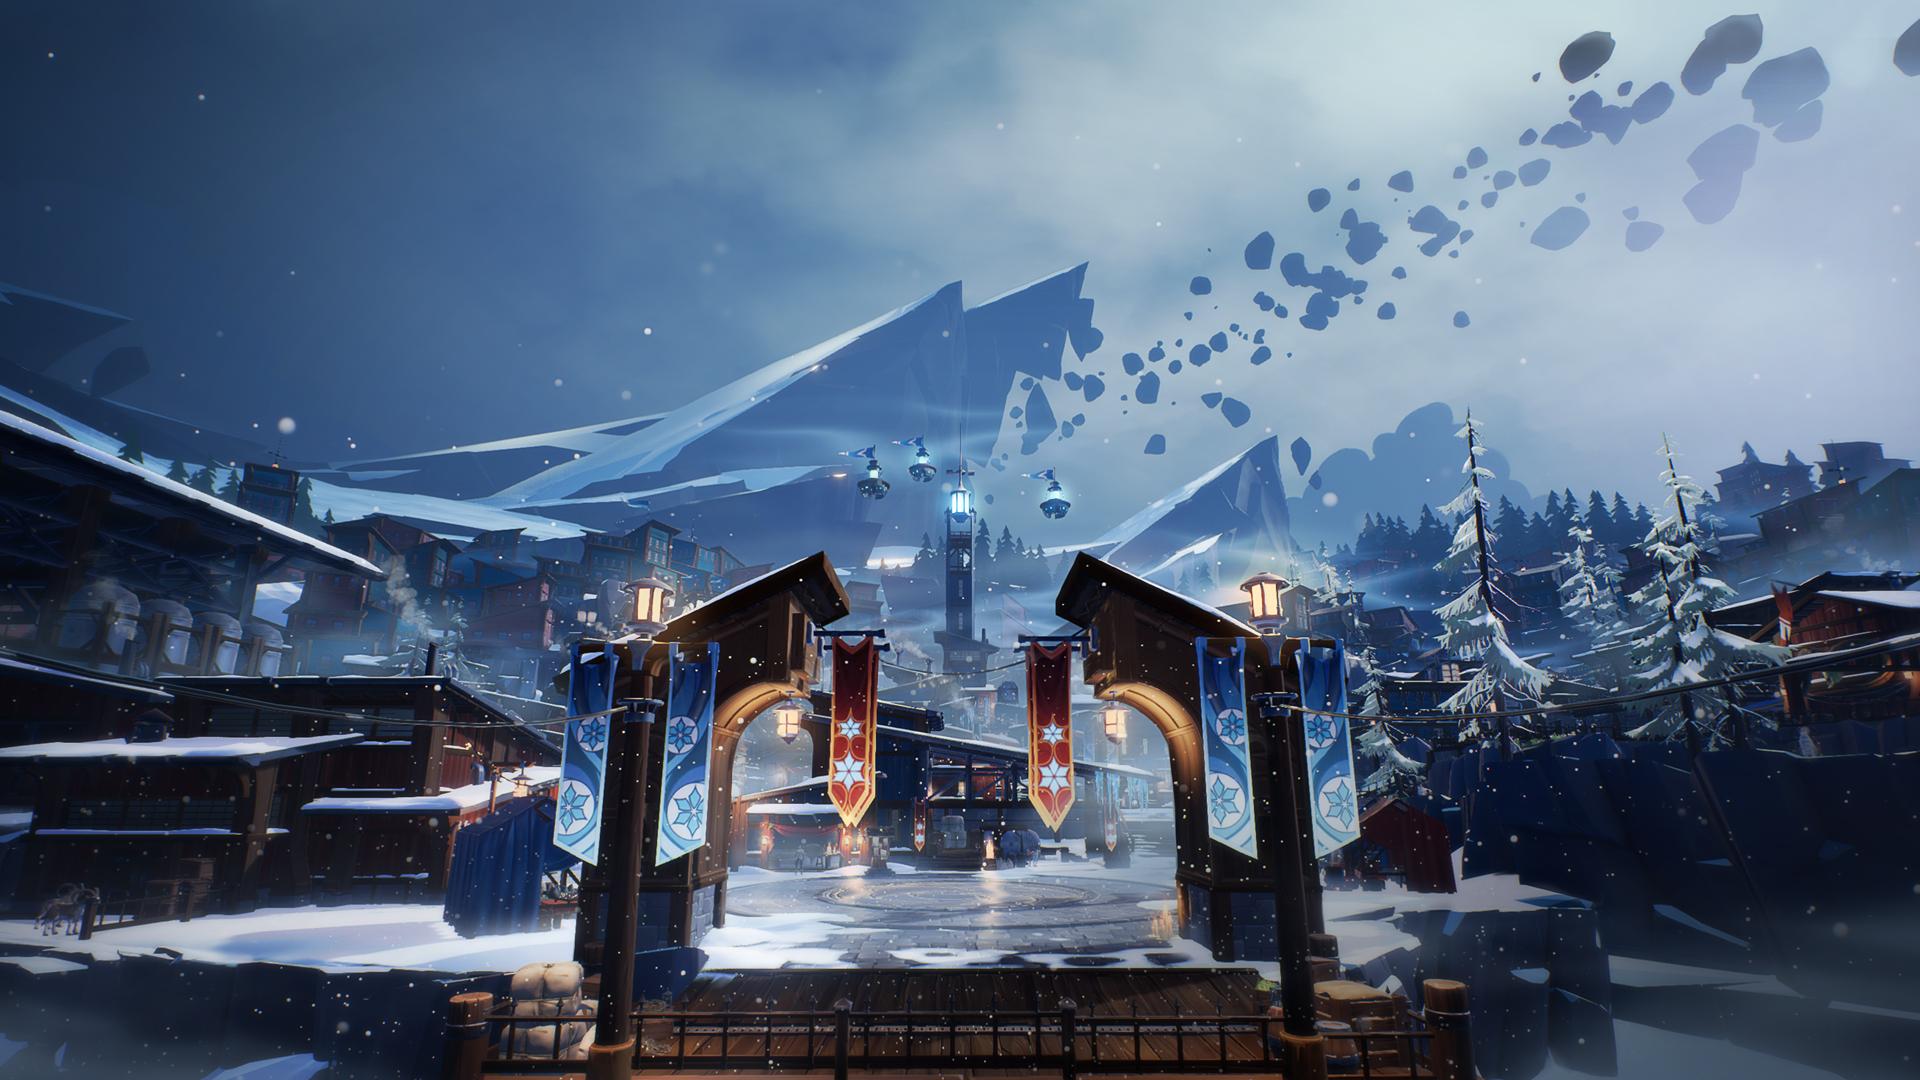 Dauntless-Frostfall-2017-Seasonal-Holiday-Event-SnowCity